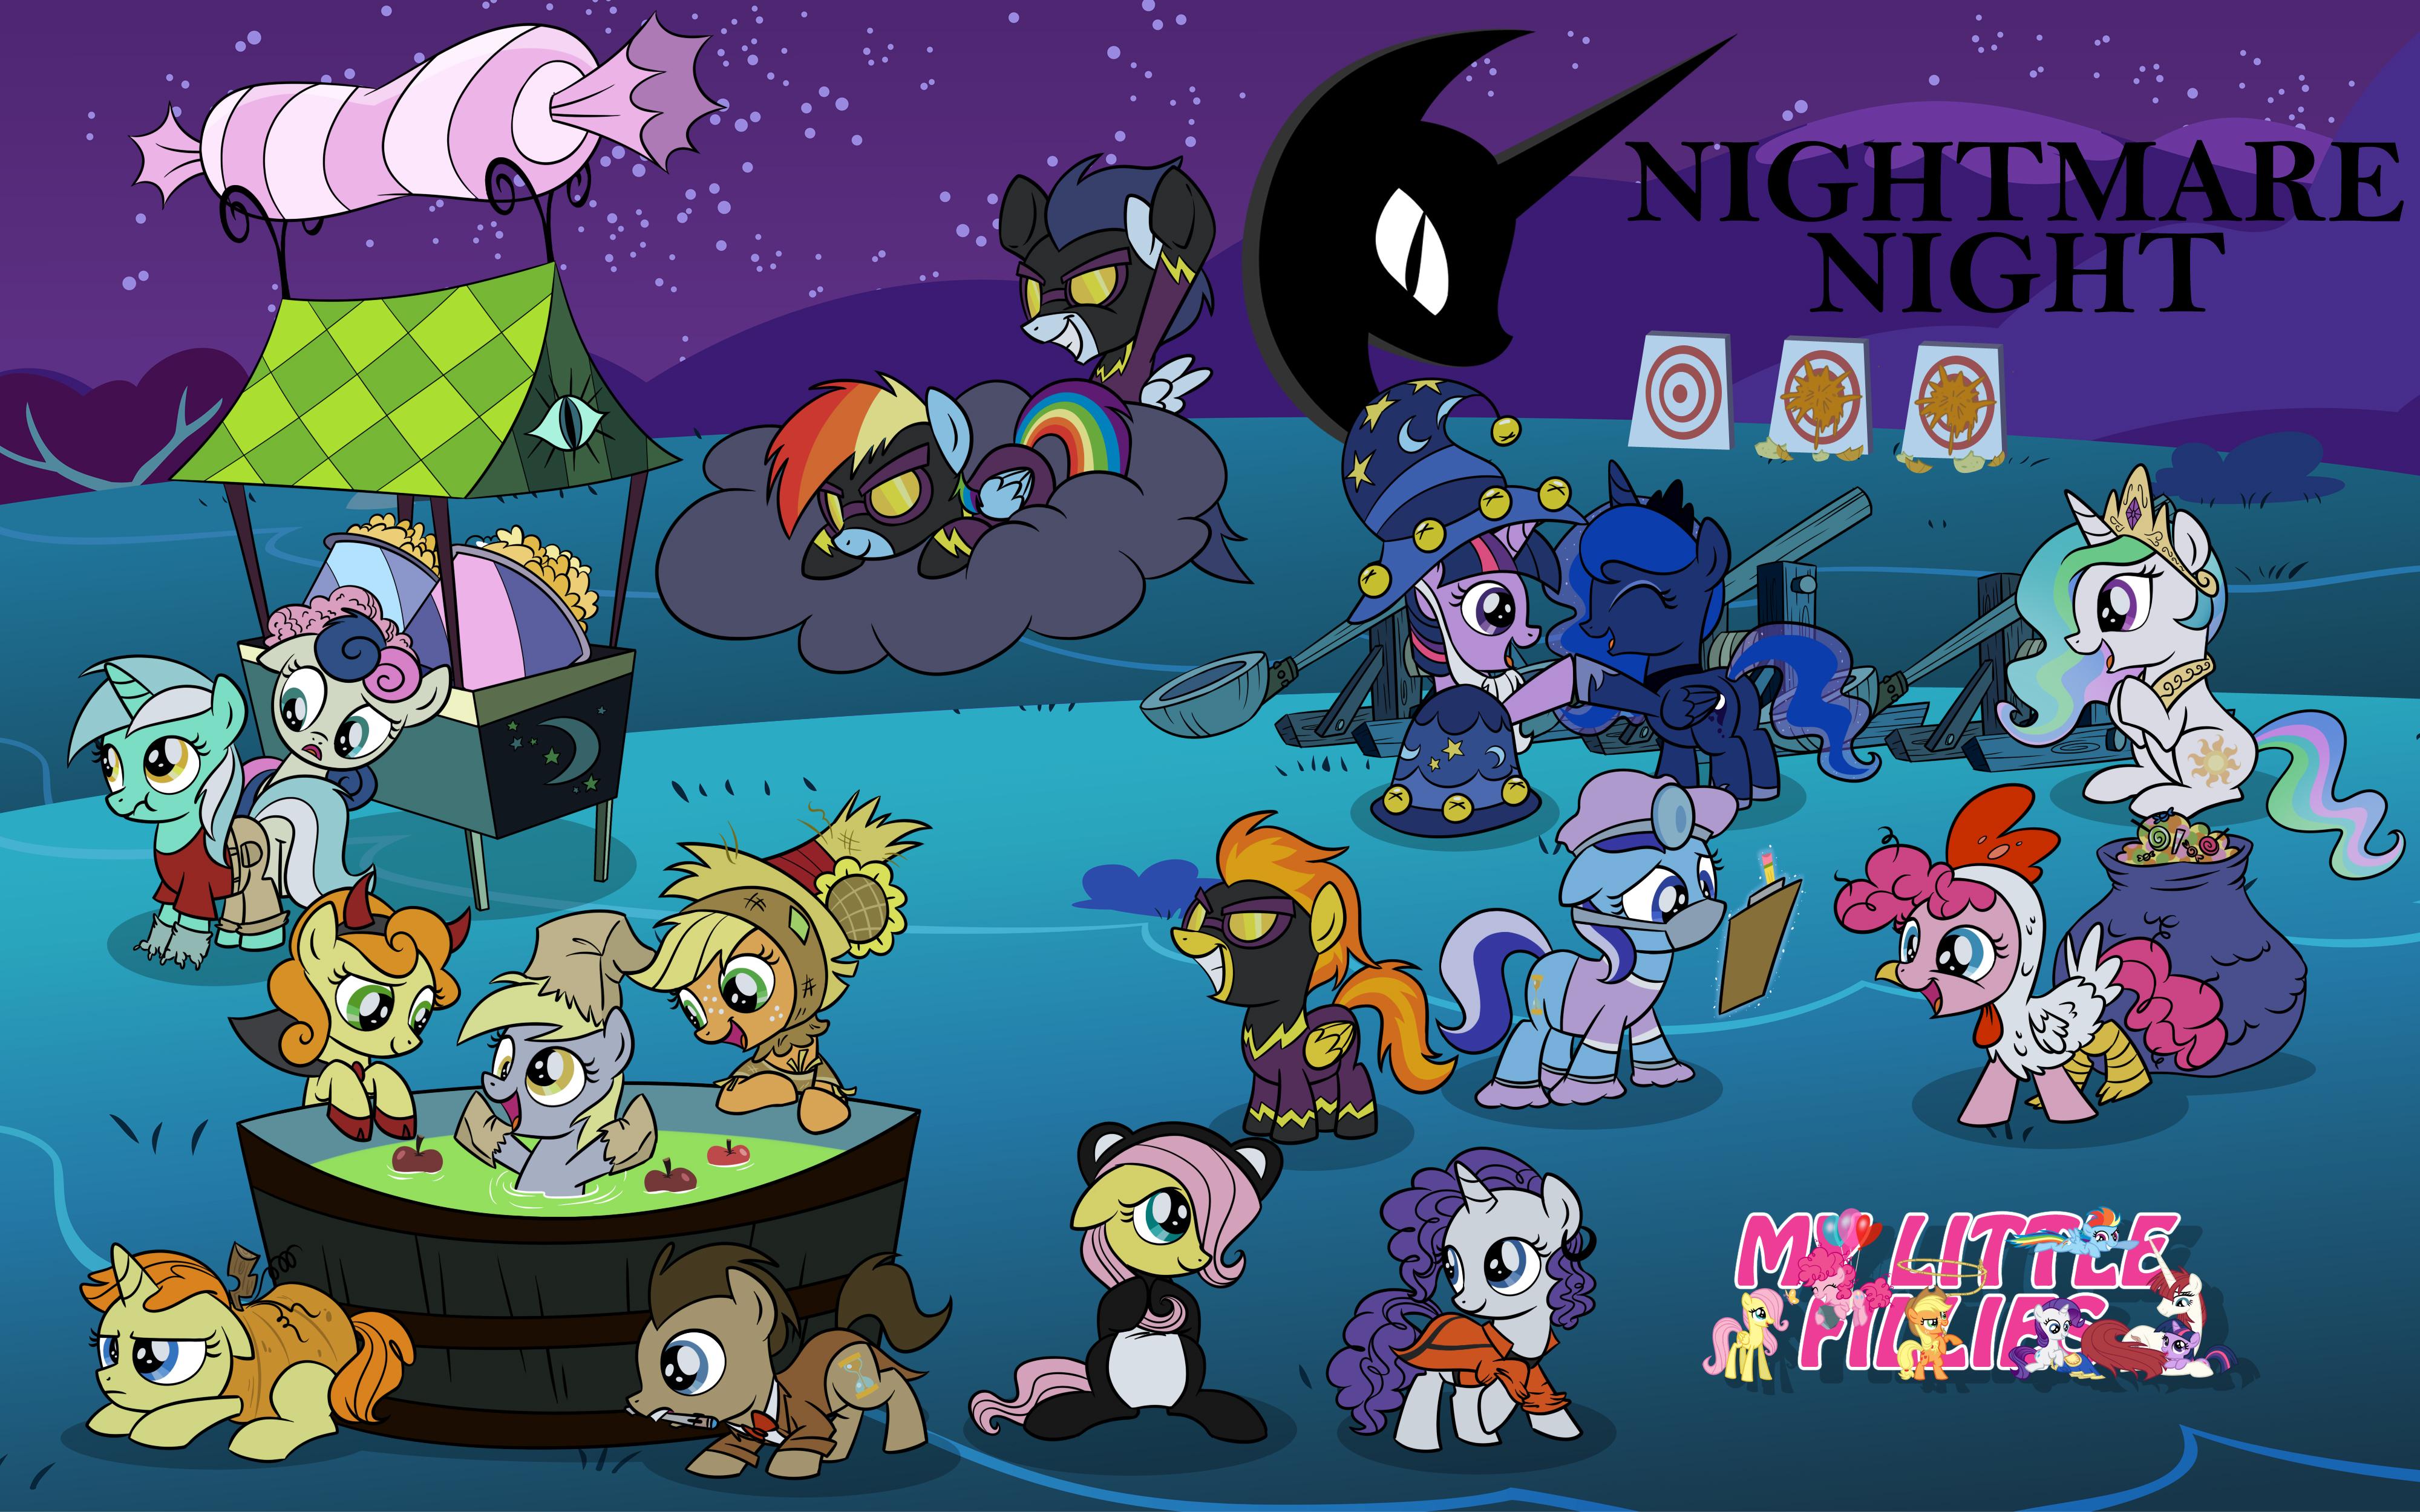 Nightmare Night Festival by SketchyJackie